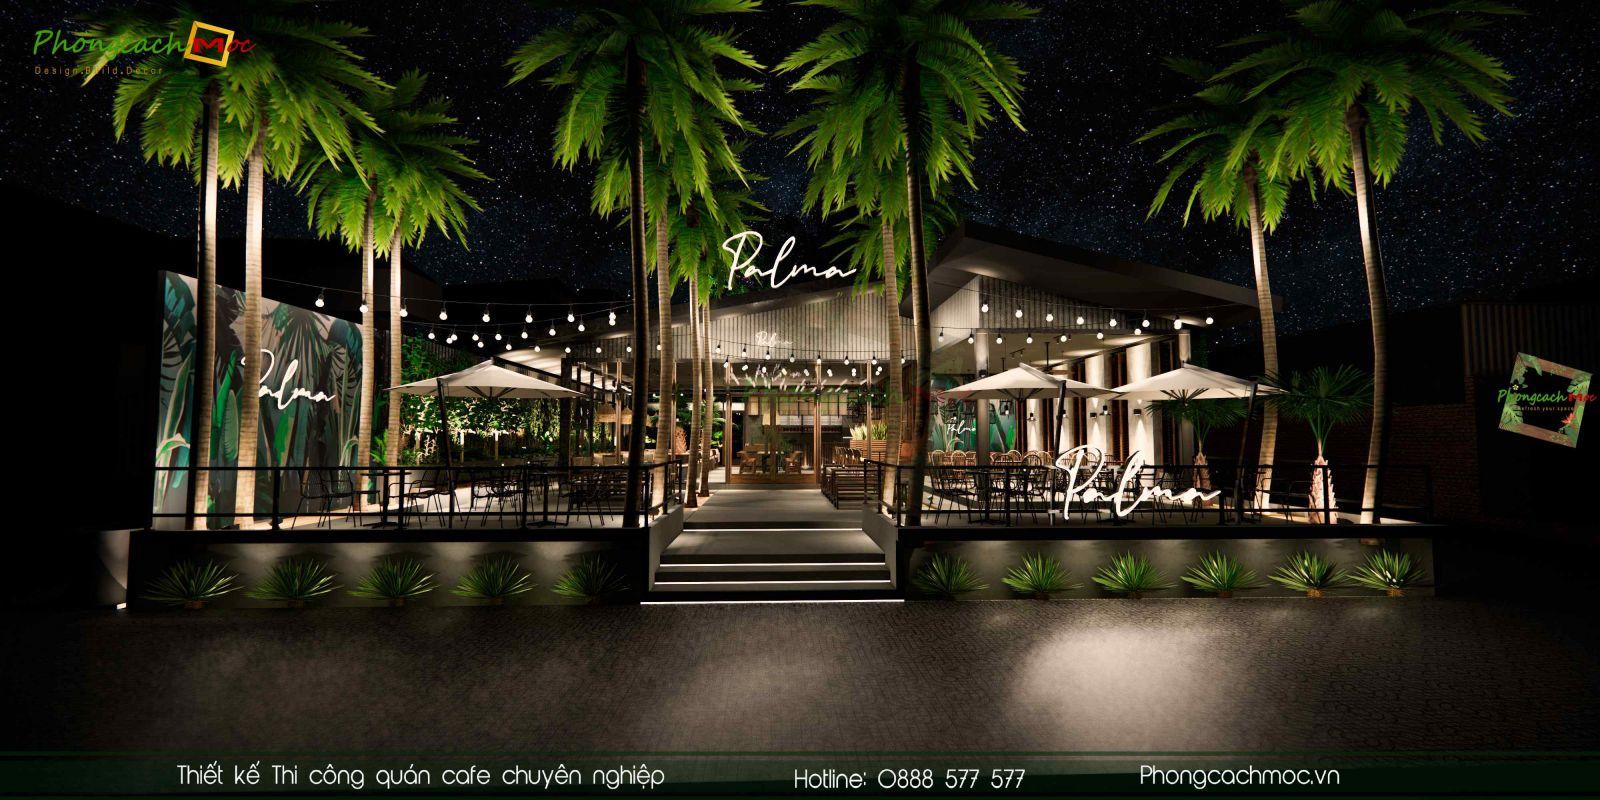 Thiết kế mặt tiền Palma Garden